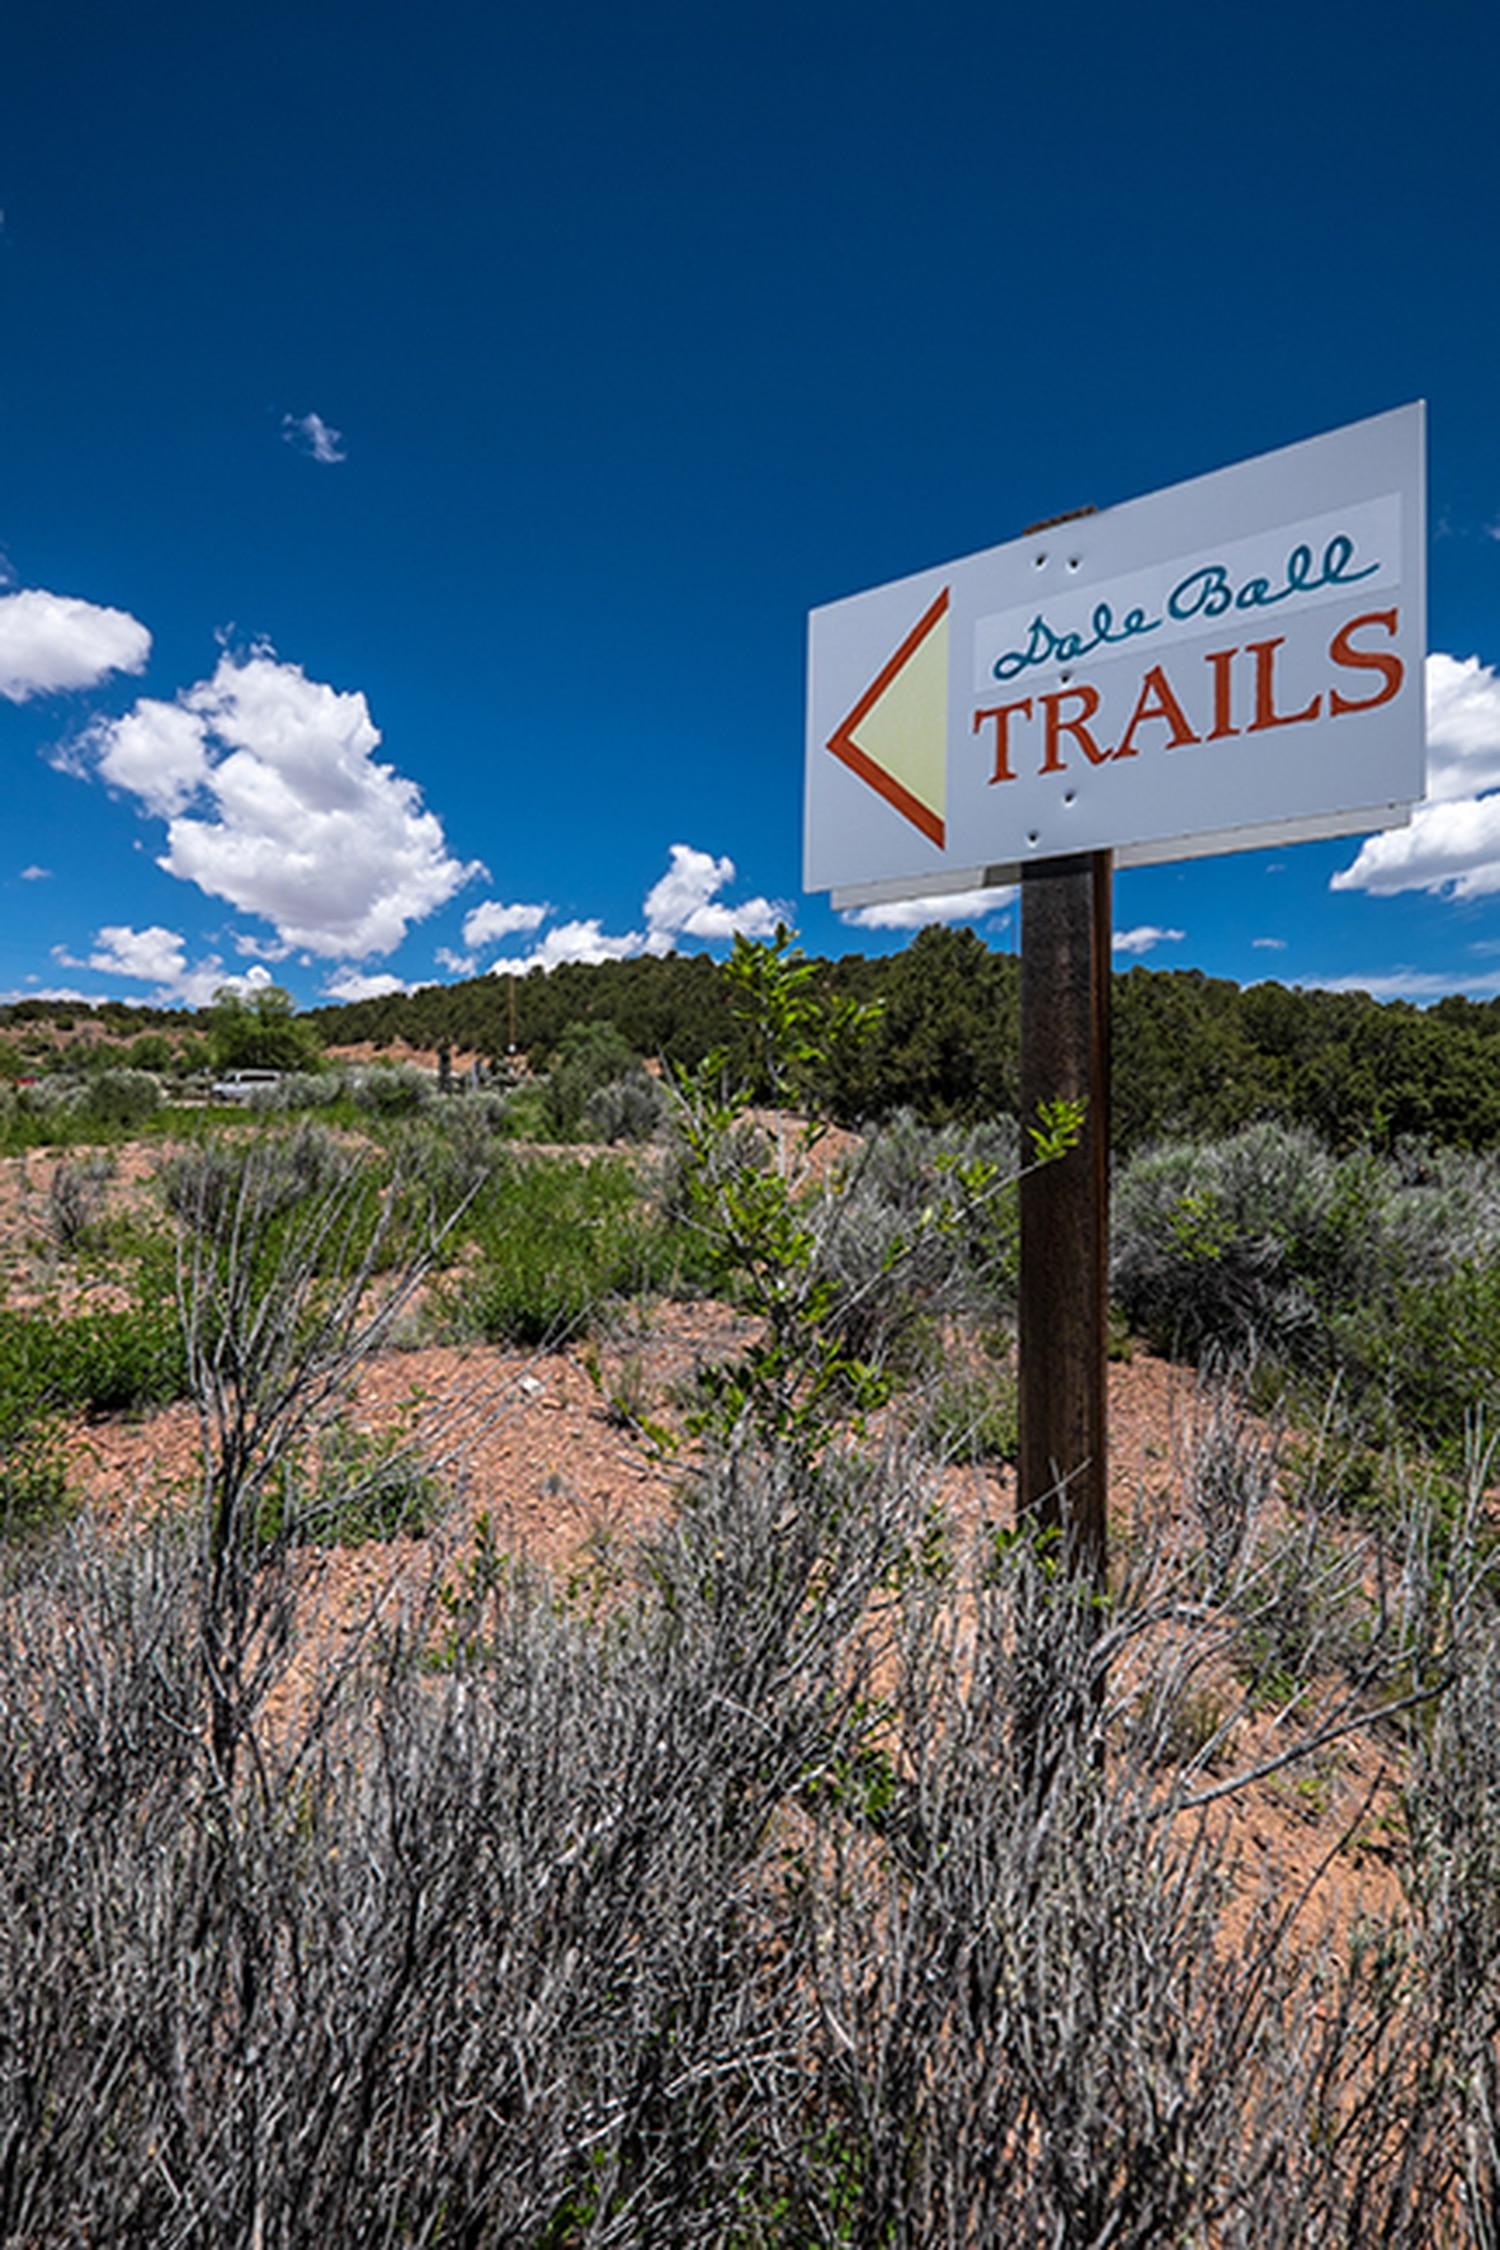 Dale Ball Trails